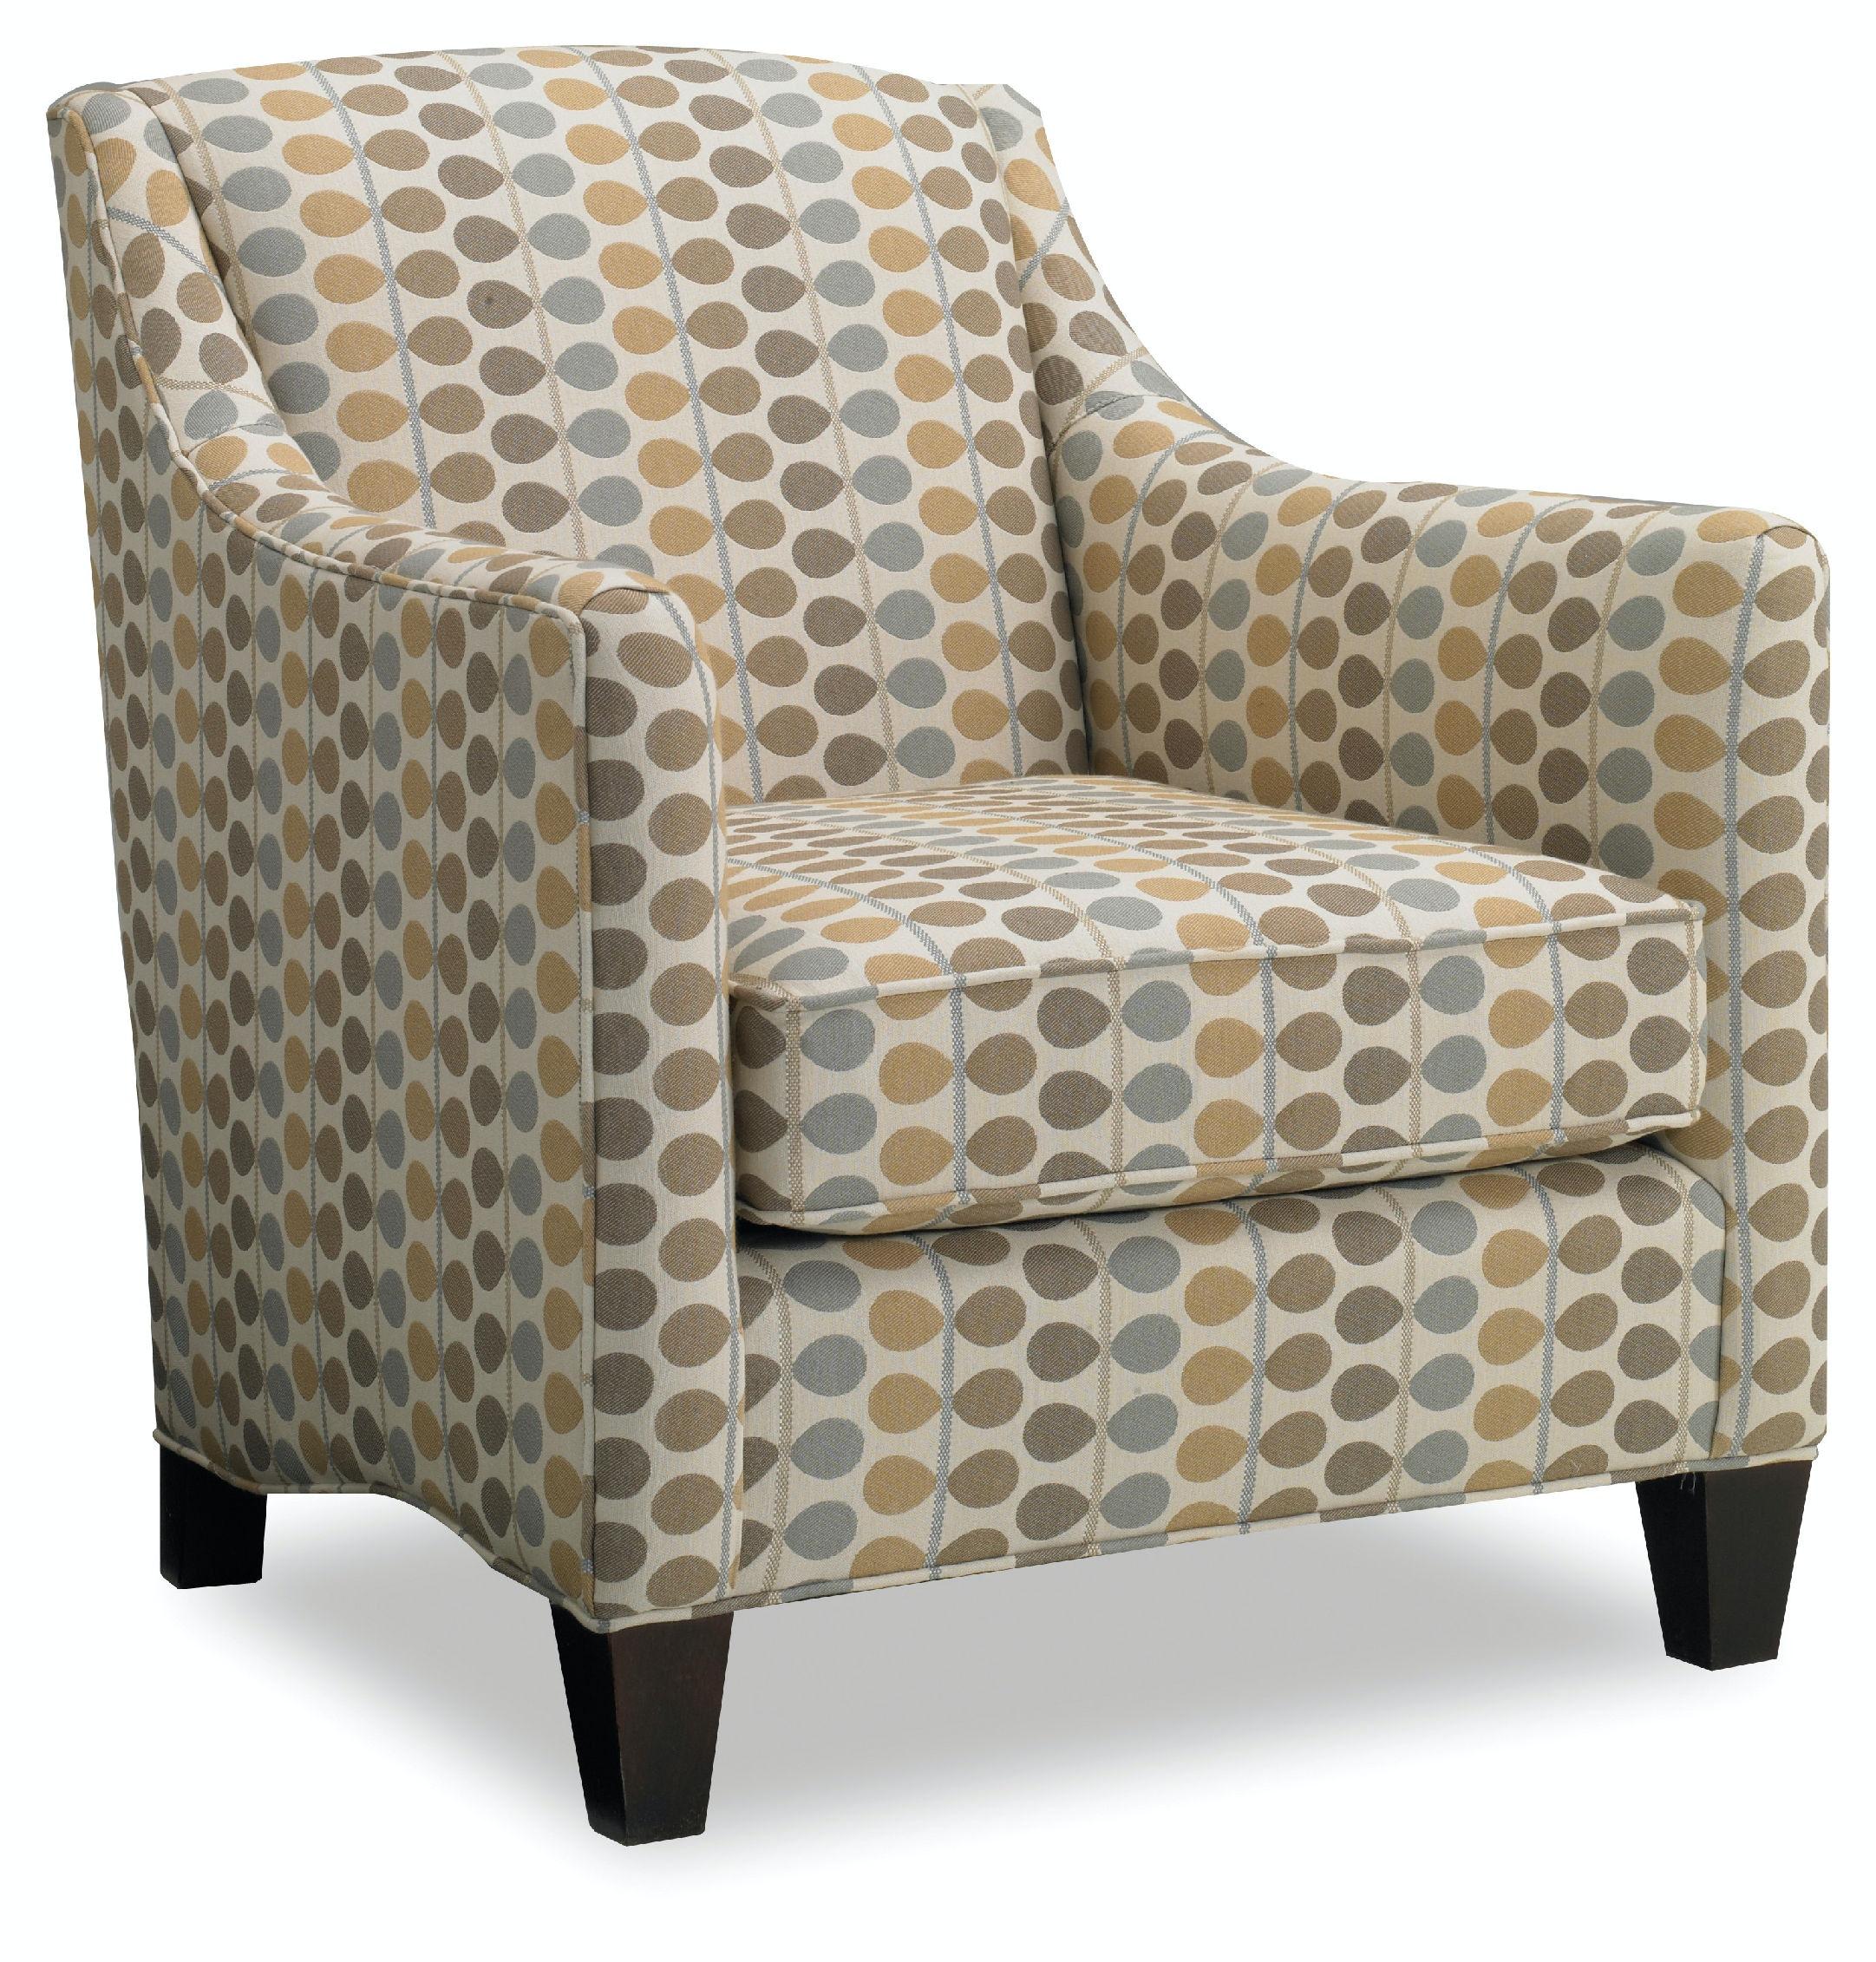 sam moore living room urban club chair 1060 - sam moore - bedford, va